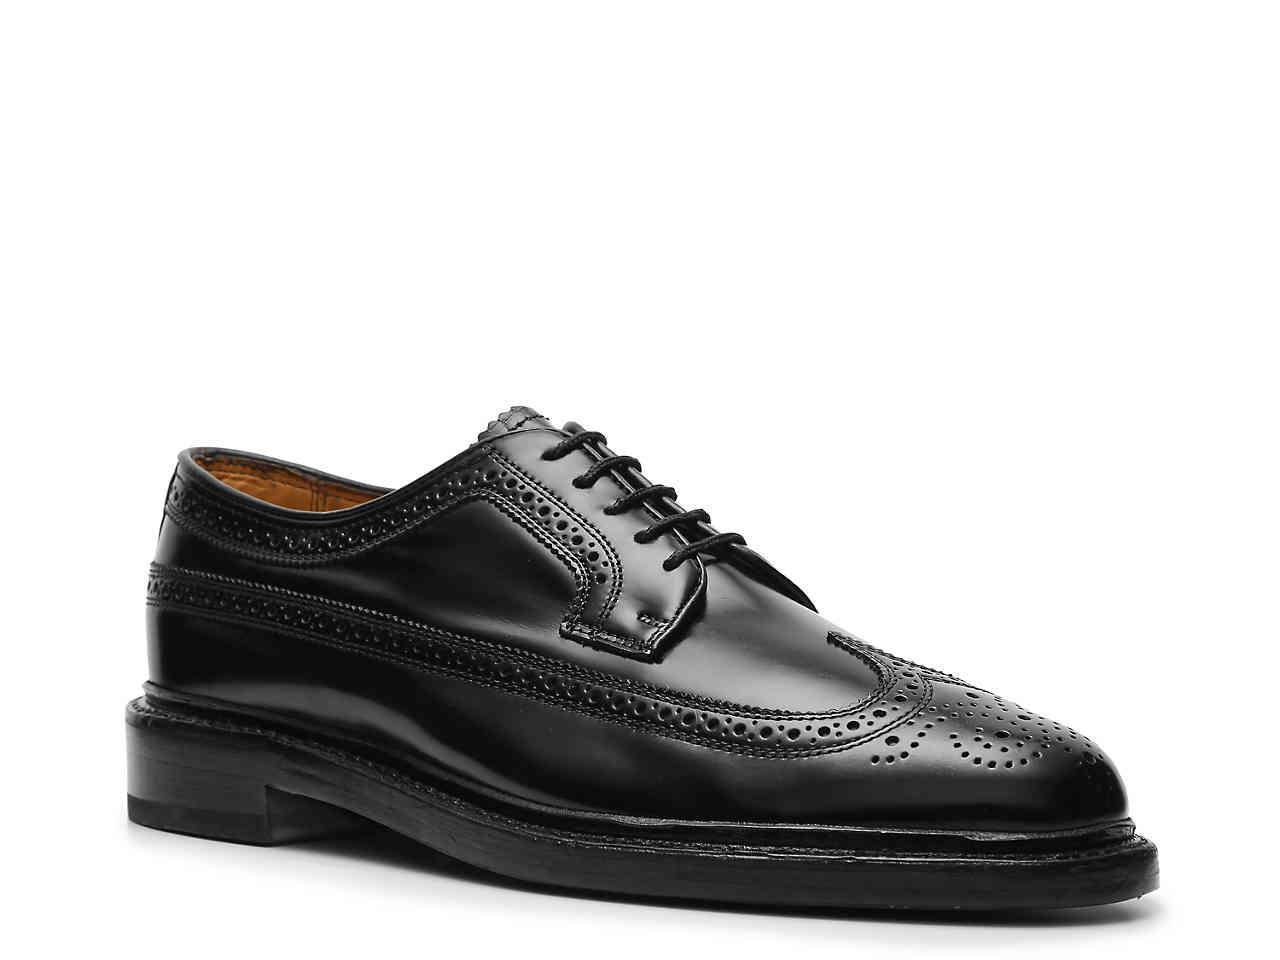 Shoe dating and maker question The Florsheim Shoe Salon